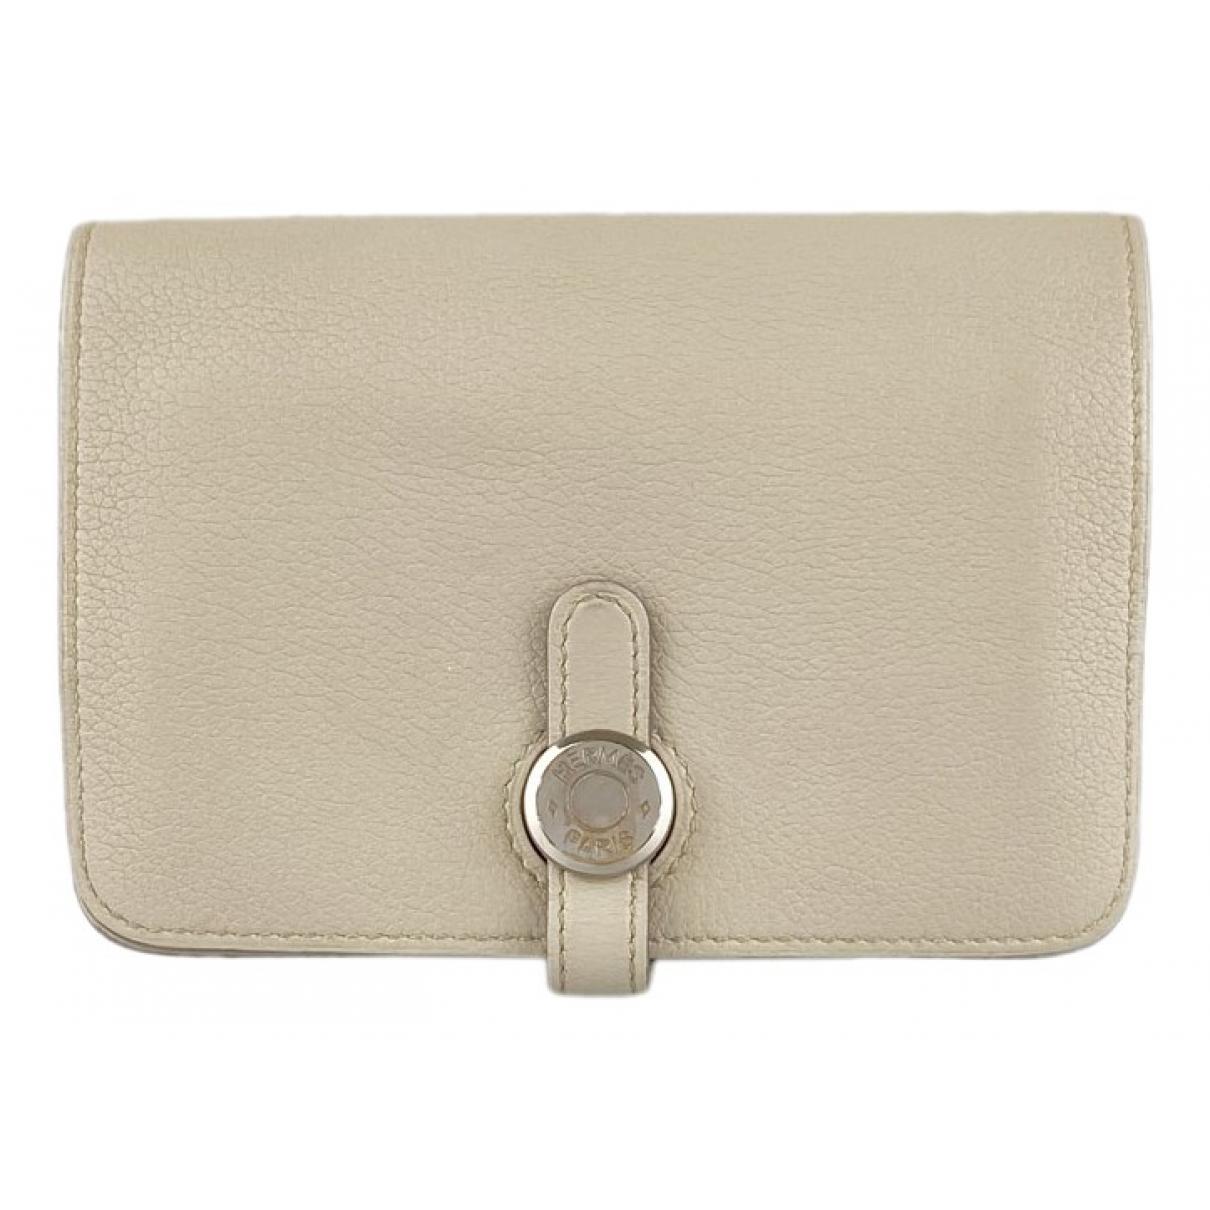 Hermès Dogon White Leather wallet for Women N